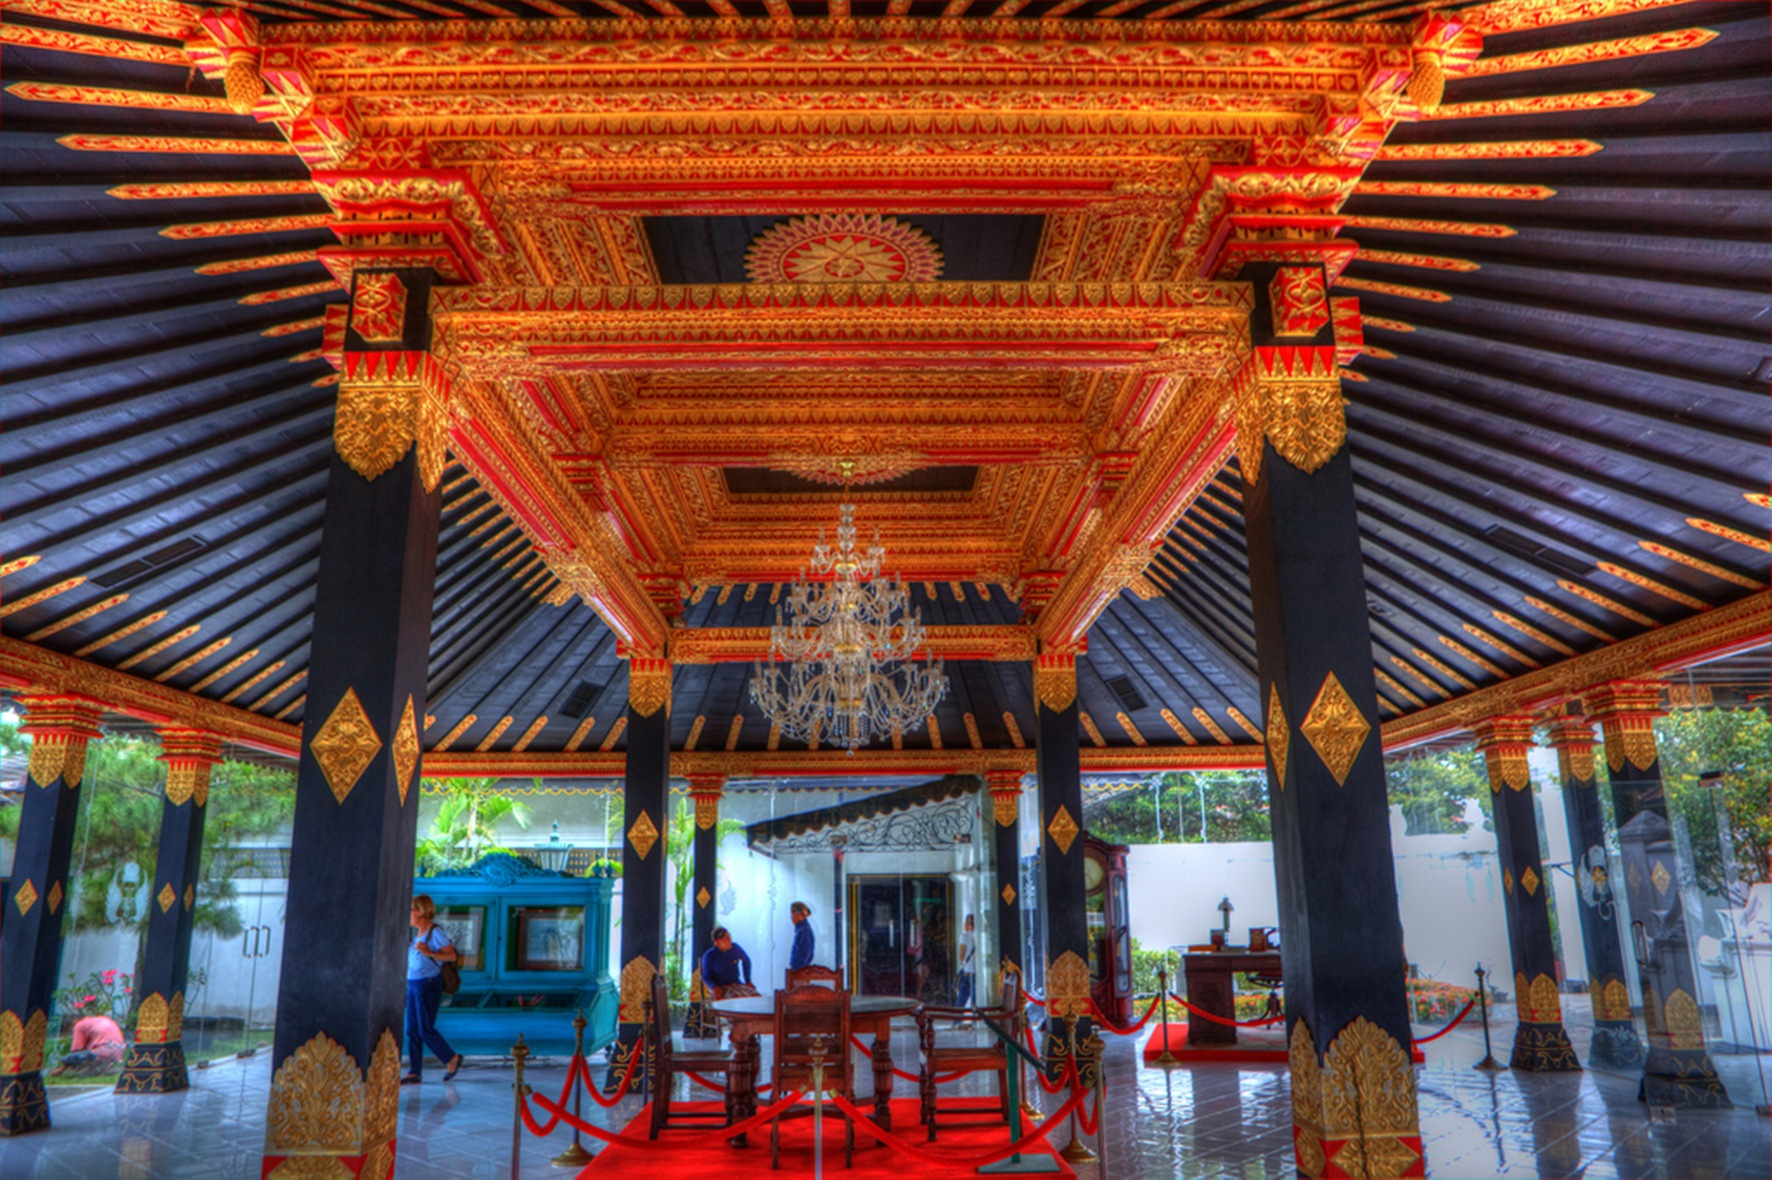 Selama Lebaran 2019 Wisata Keraton Yogyakarta Ditutup 3